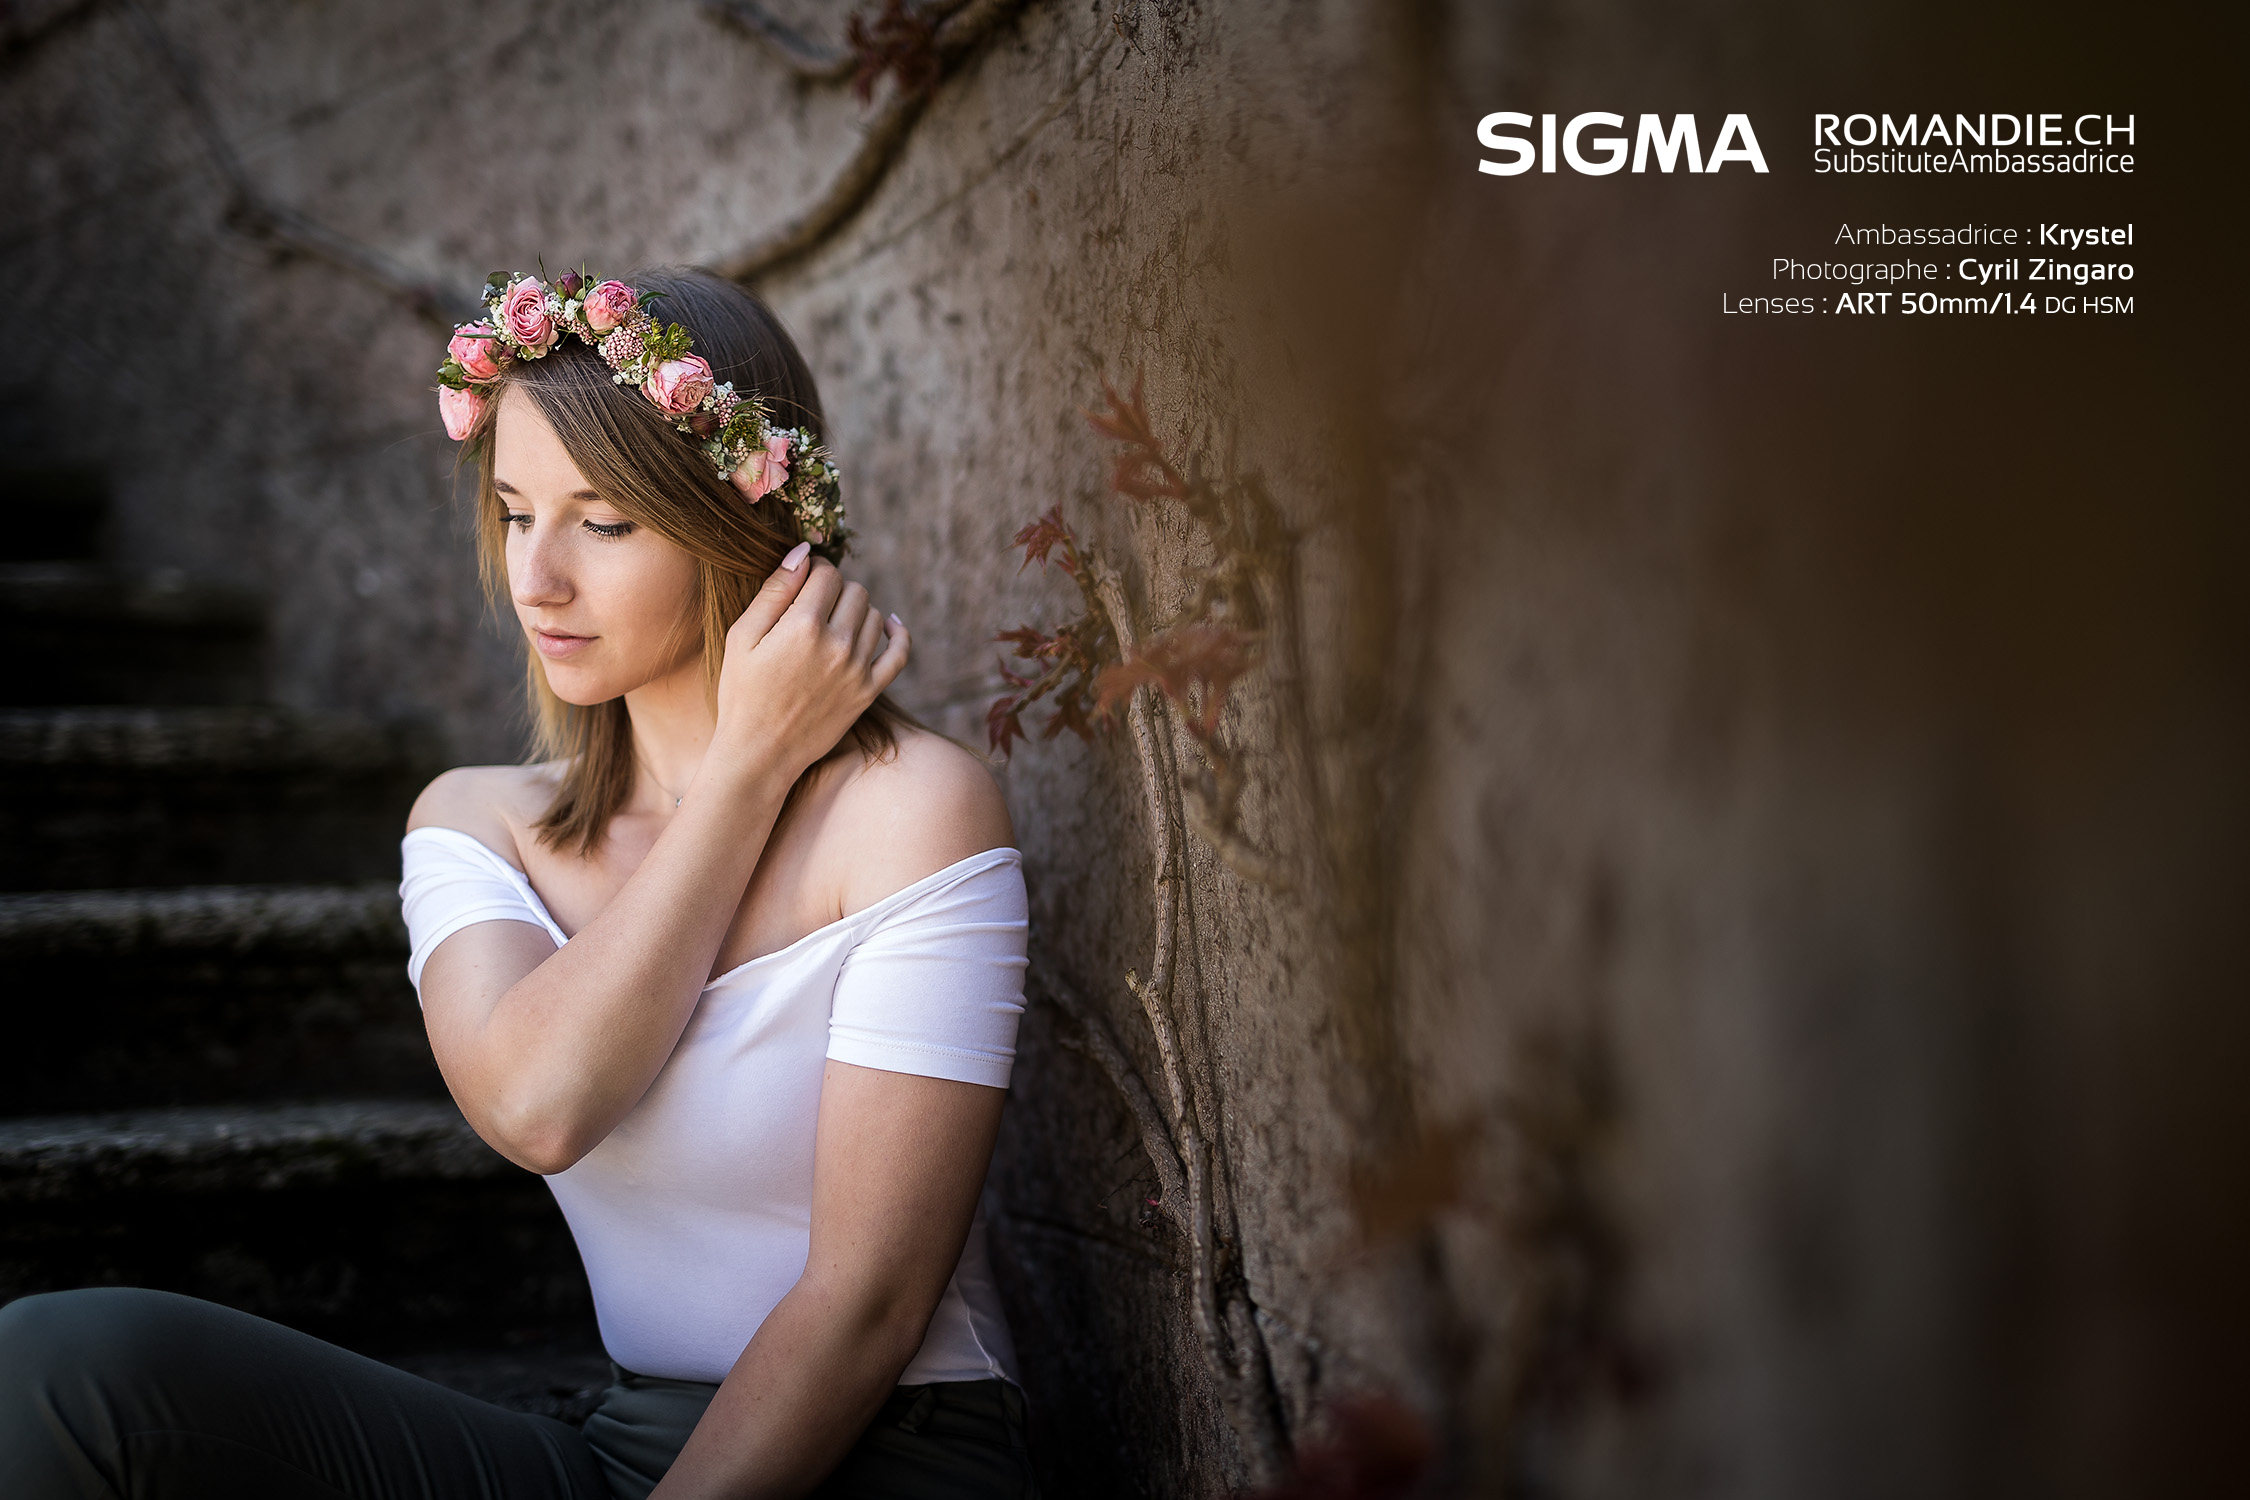 sigma_ambassadrice_2019_09HD